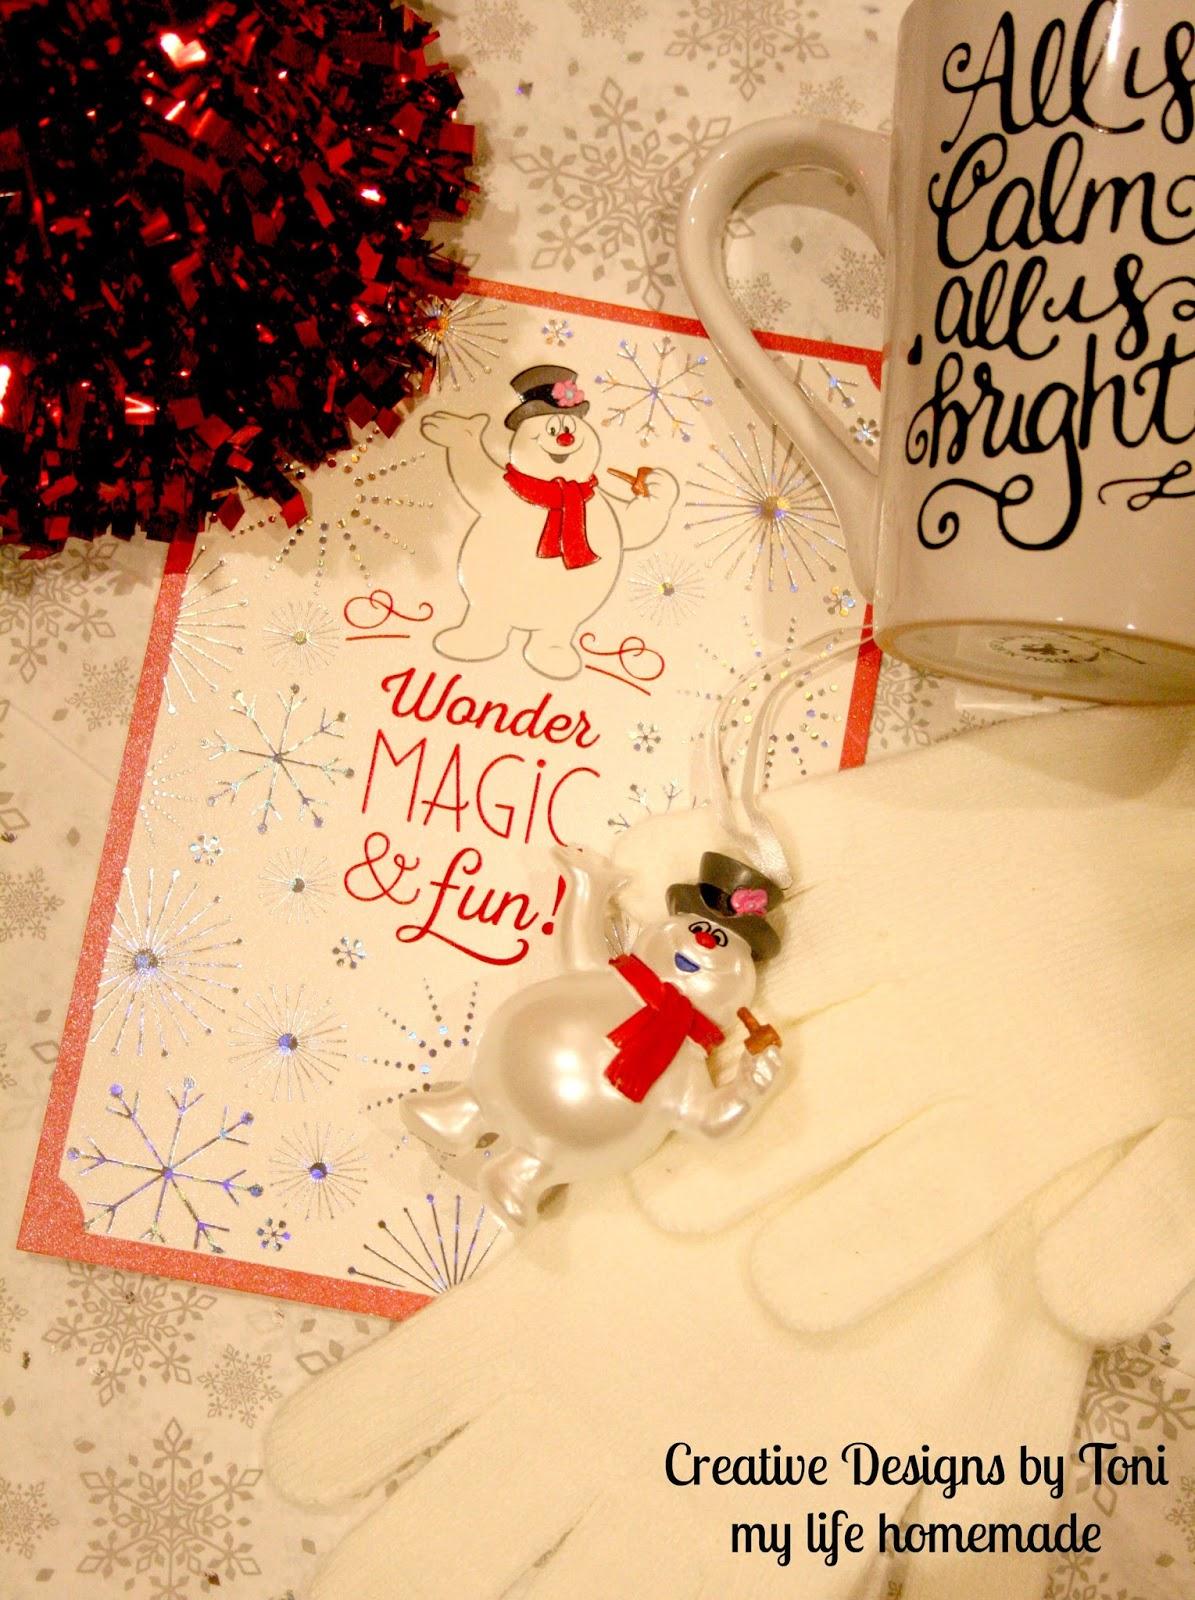 My Life Homemade Send A Warm Holiday Greeting With Hallmark